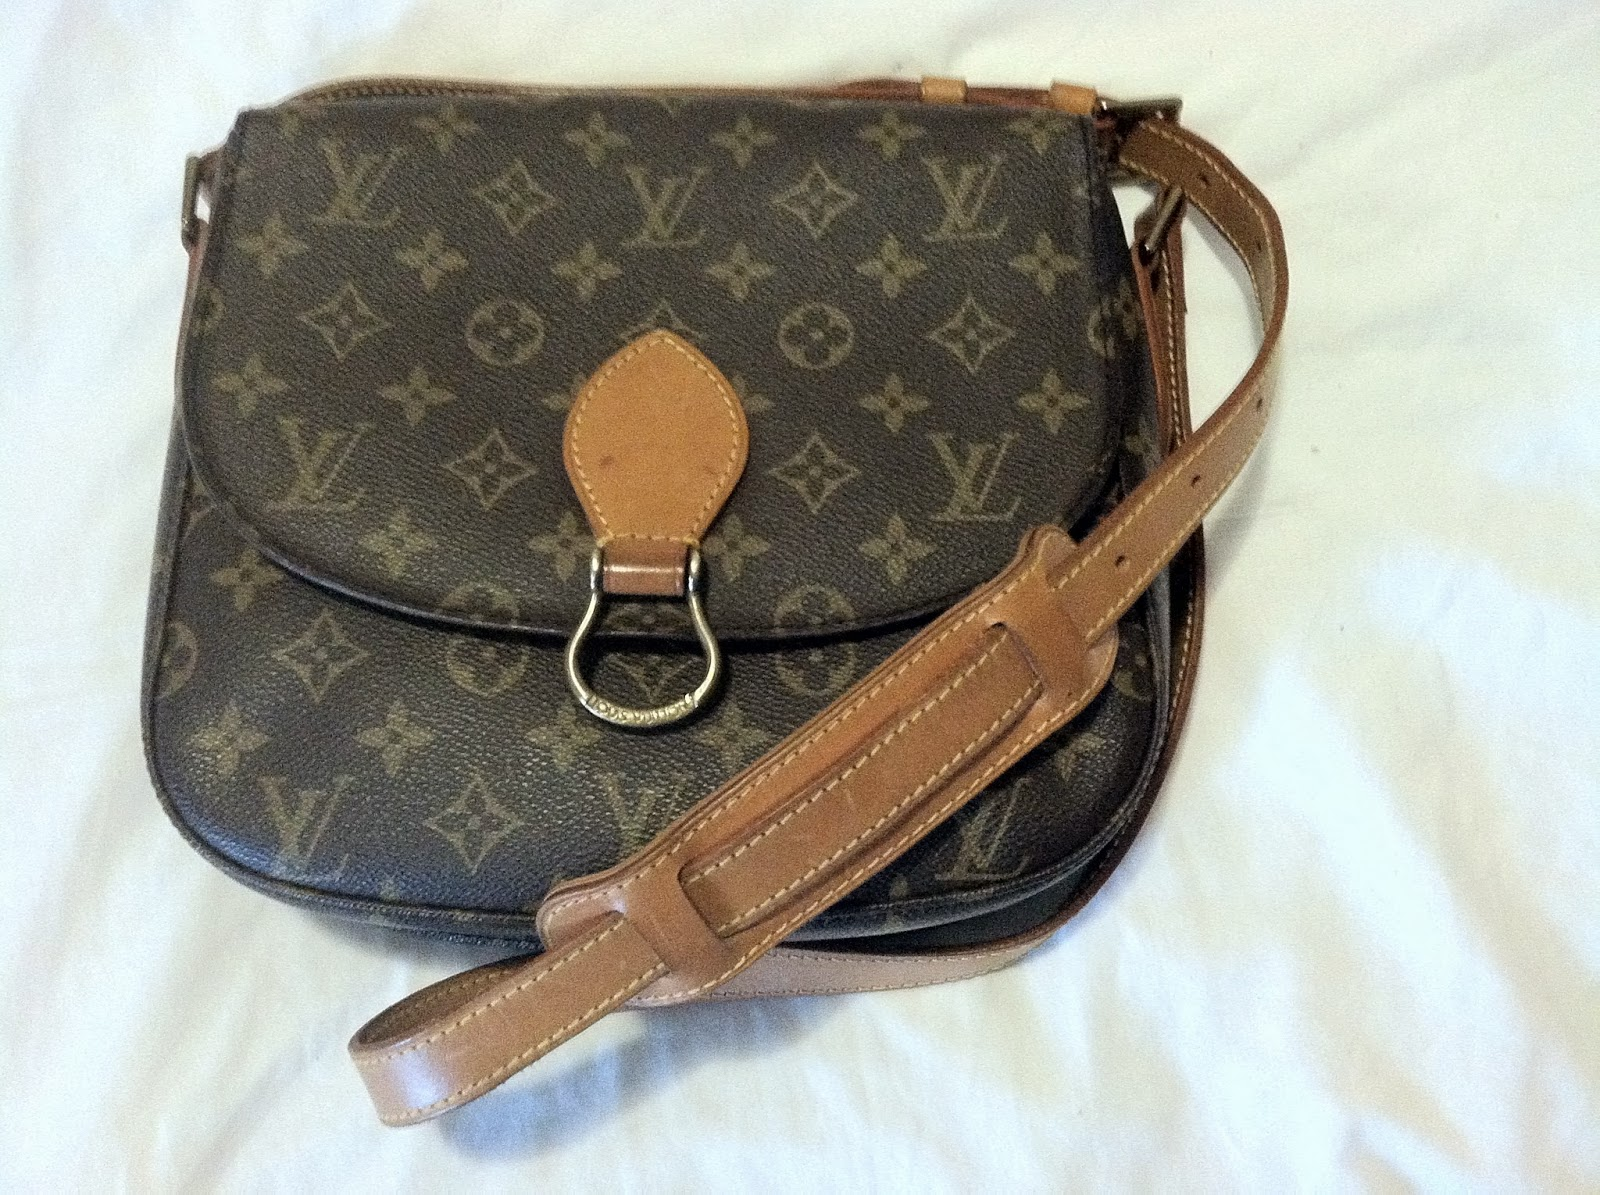 lv how louis supplies coutureusa vuitton to clean purses cadillac blog bags bag safely